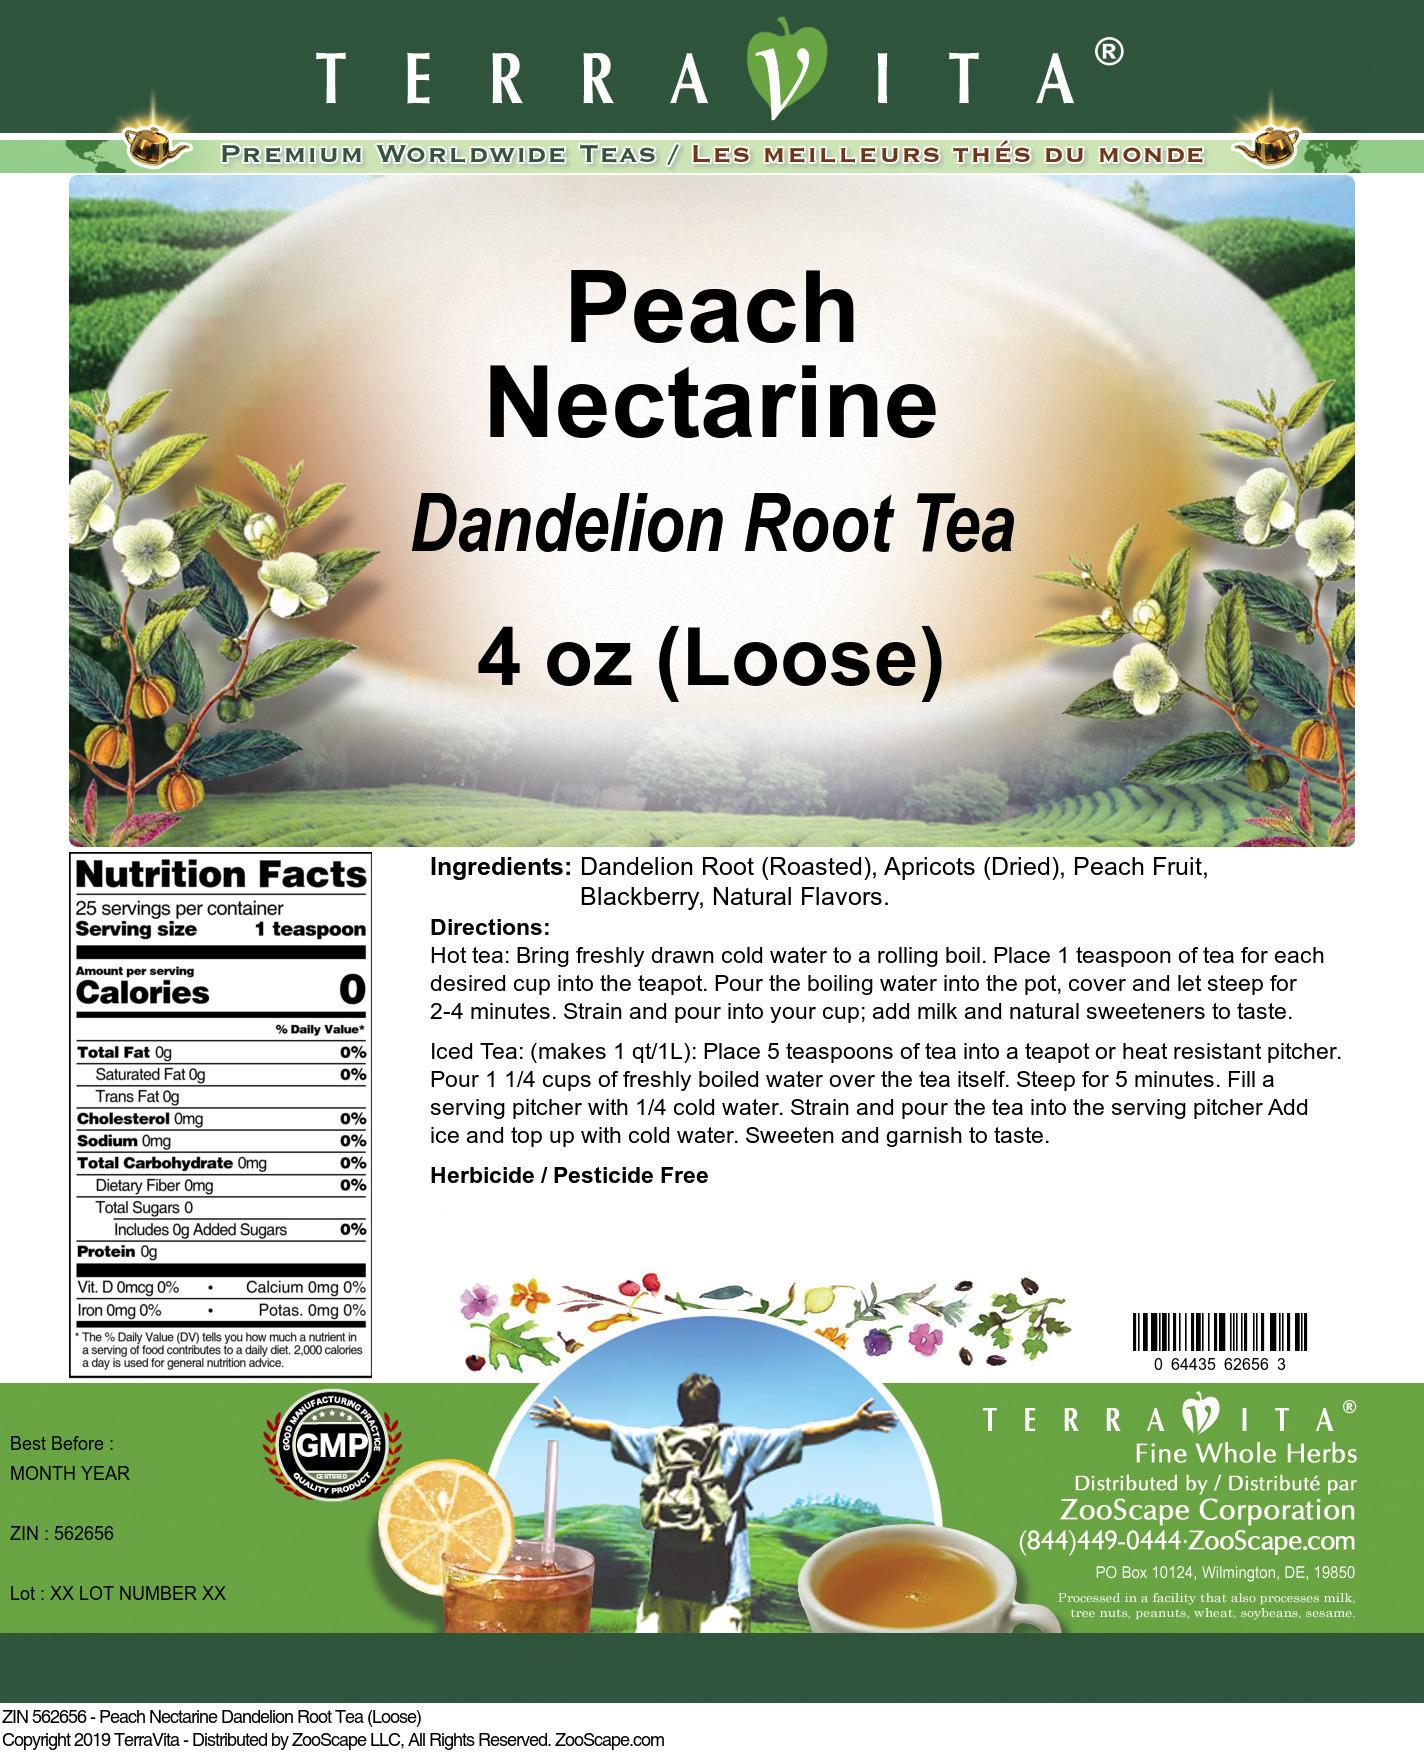 Peach Nectarine Dandelion Root Tea (Loose)